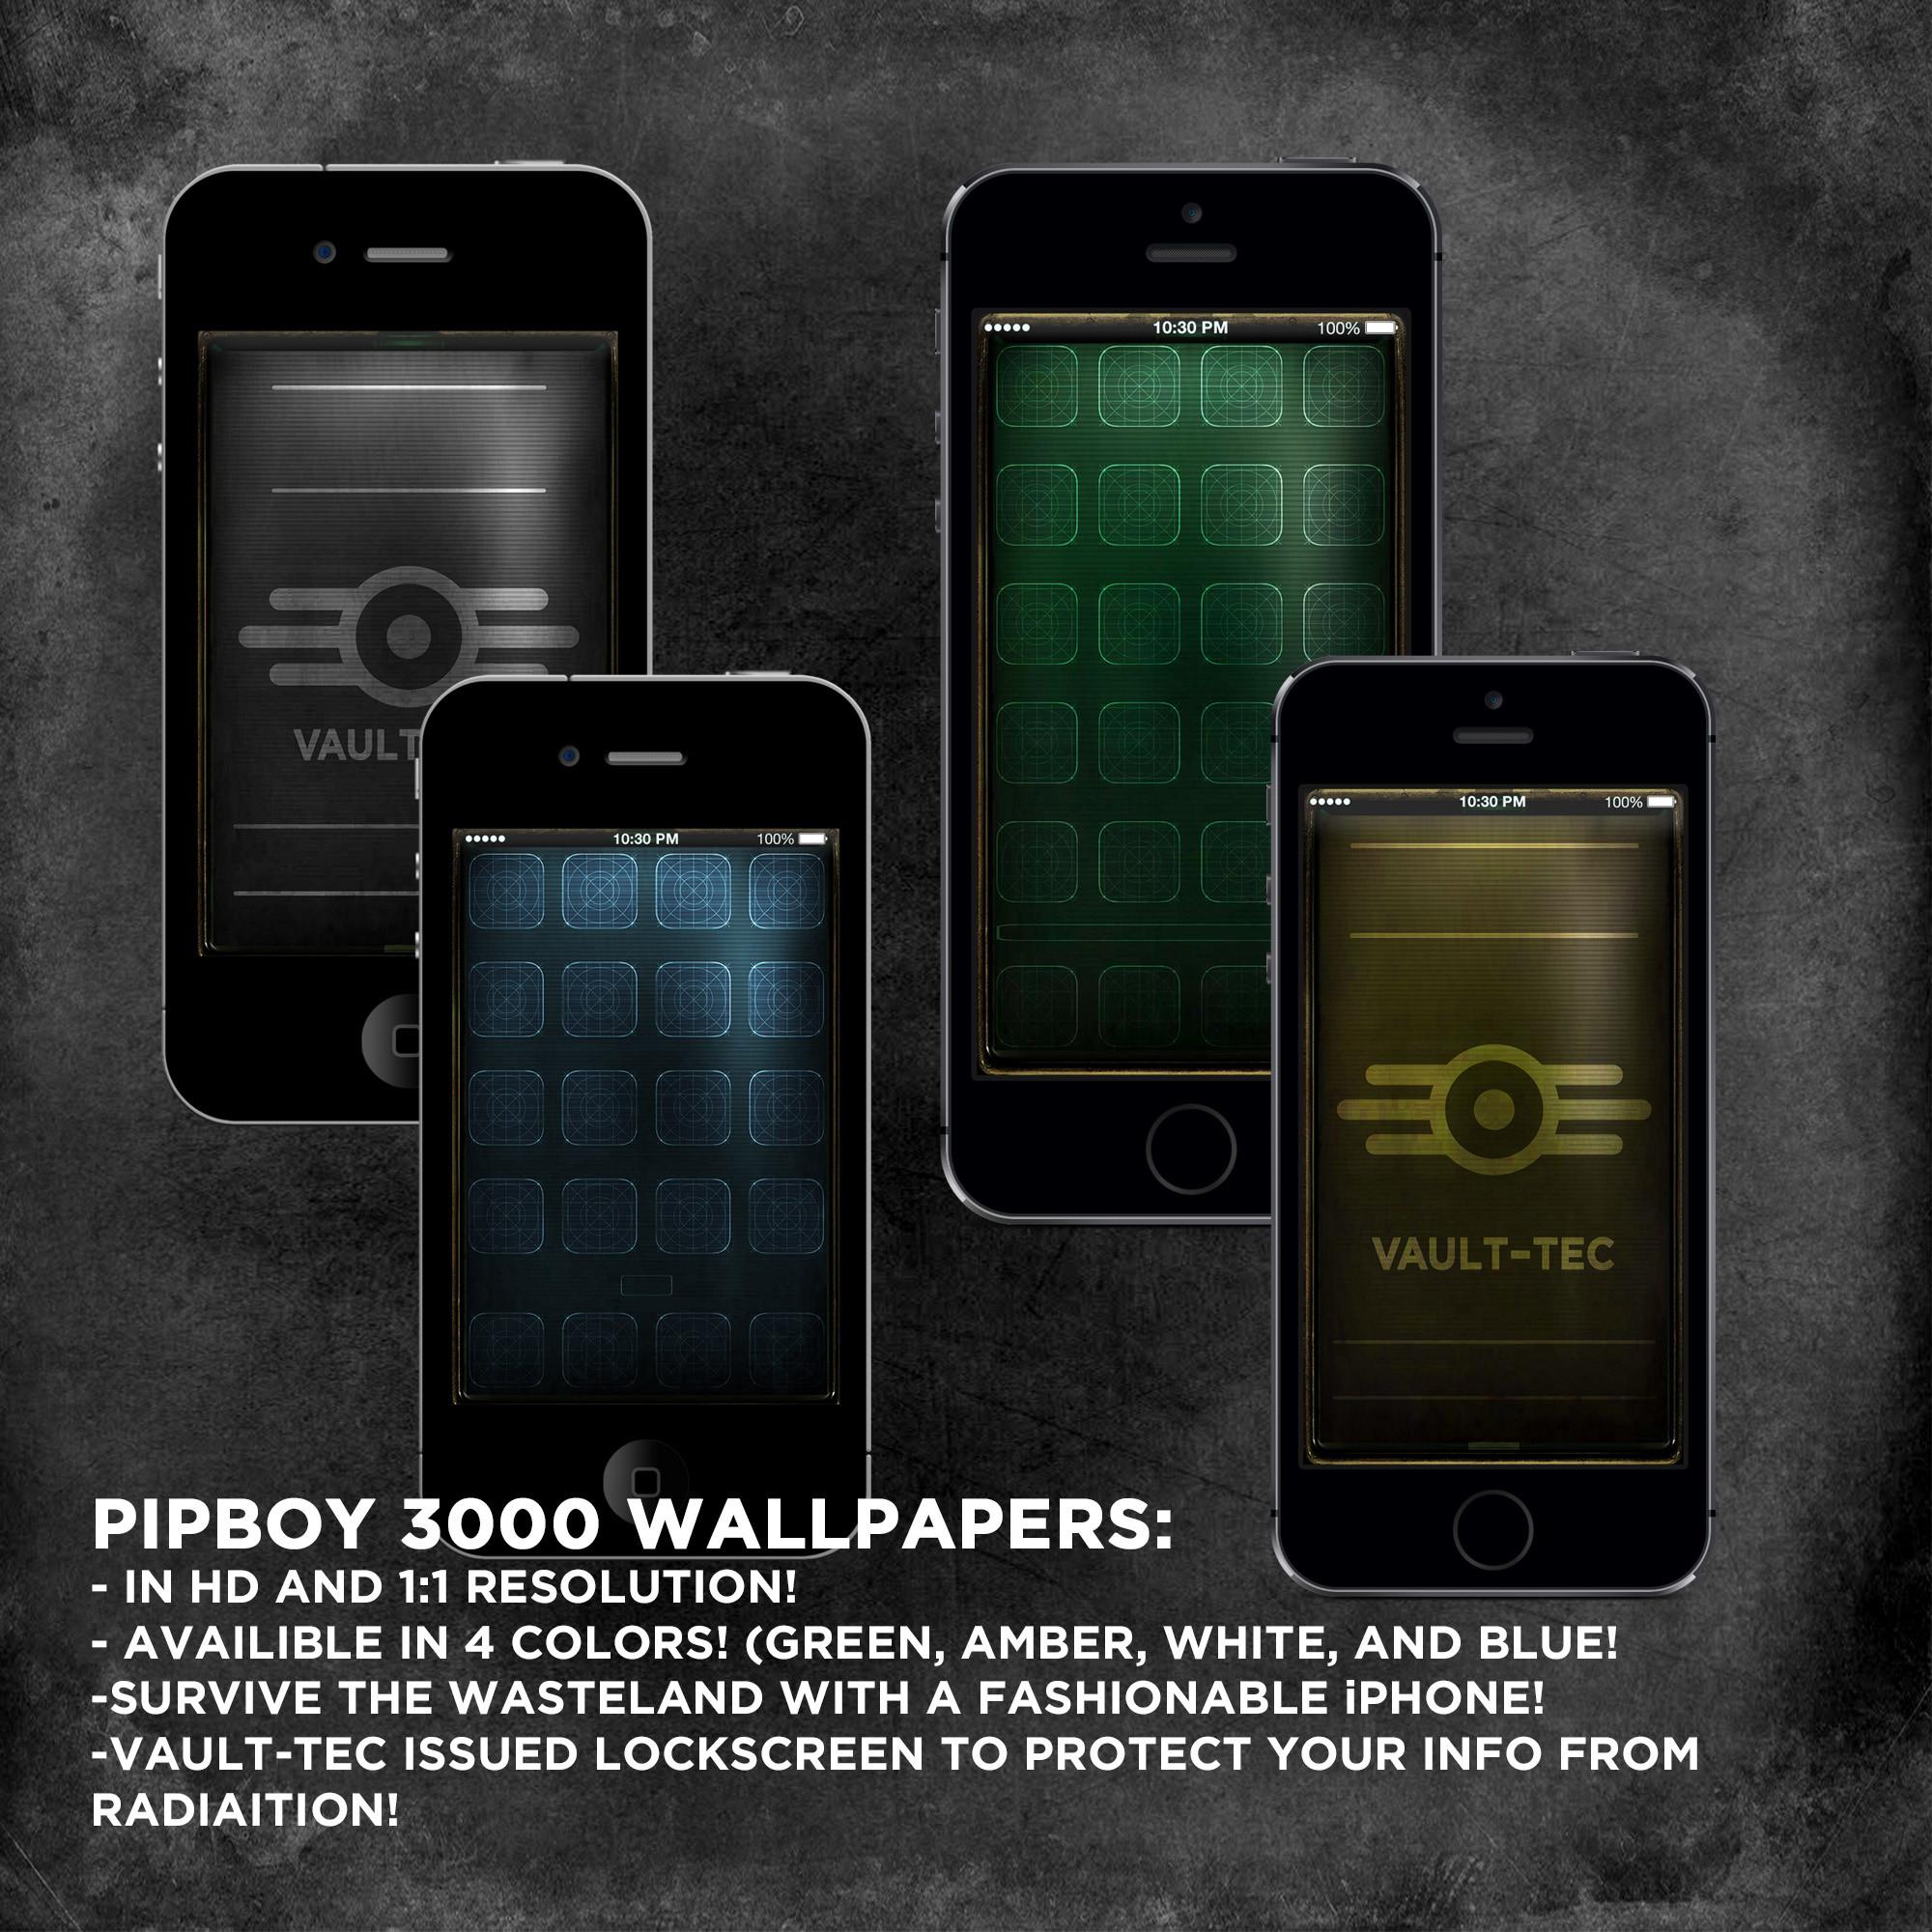 pipboy wallpapers fallout 3 nv by sitrirokoia customization wallpaper .